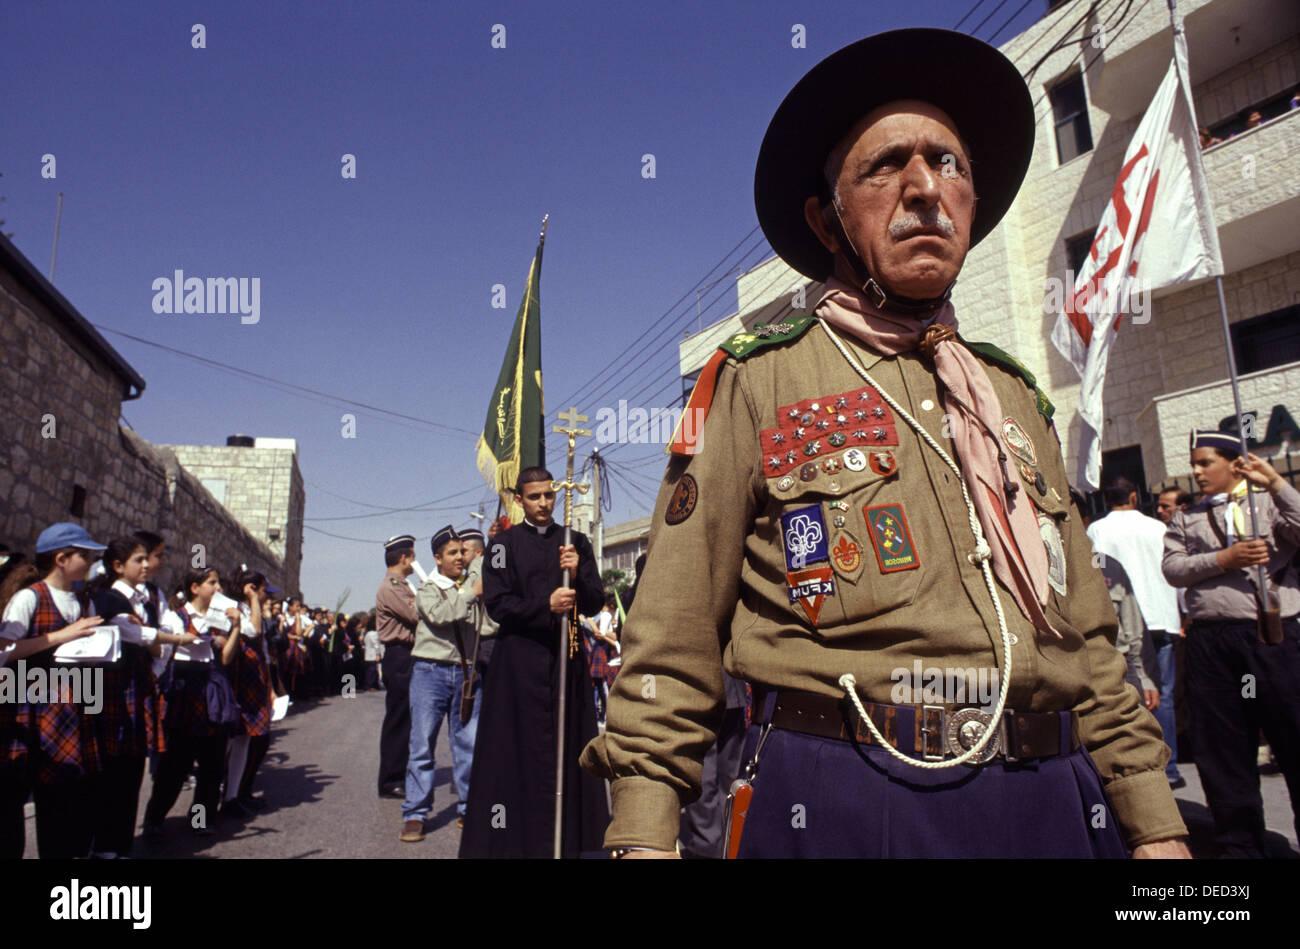 Arab catholic scout group marching during Palm Sunday celebration in Mount of Olives East Jerusalem Israel - Stock Image